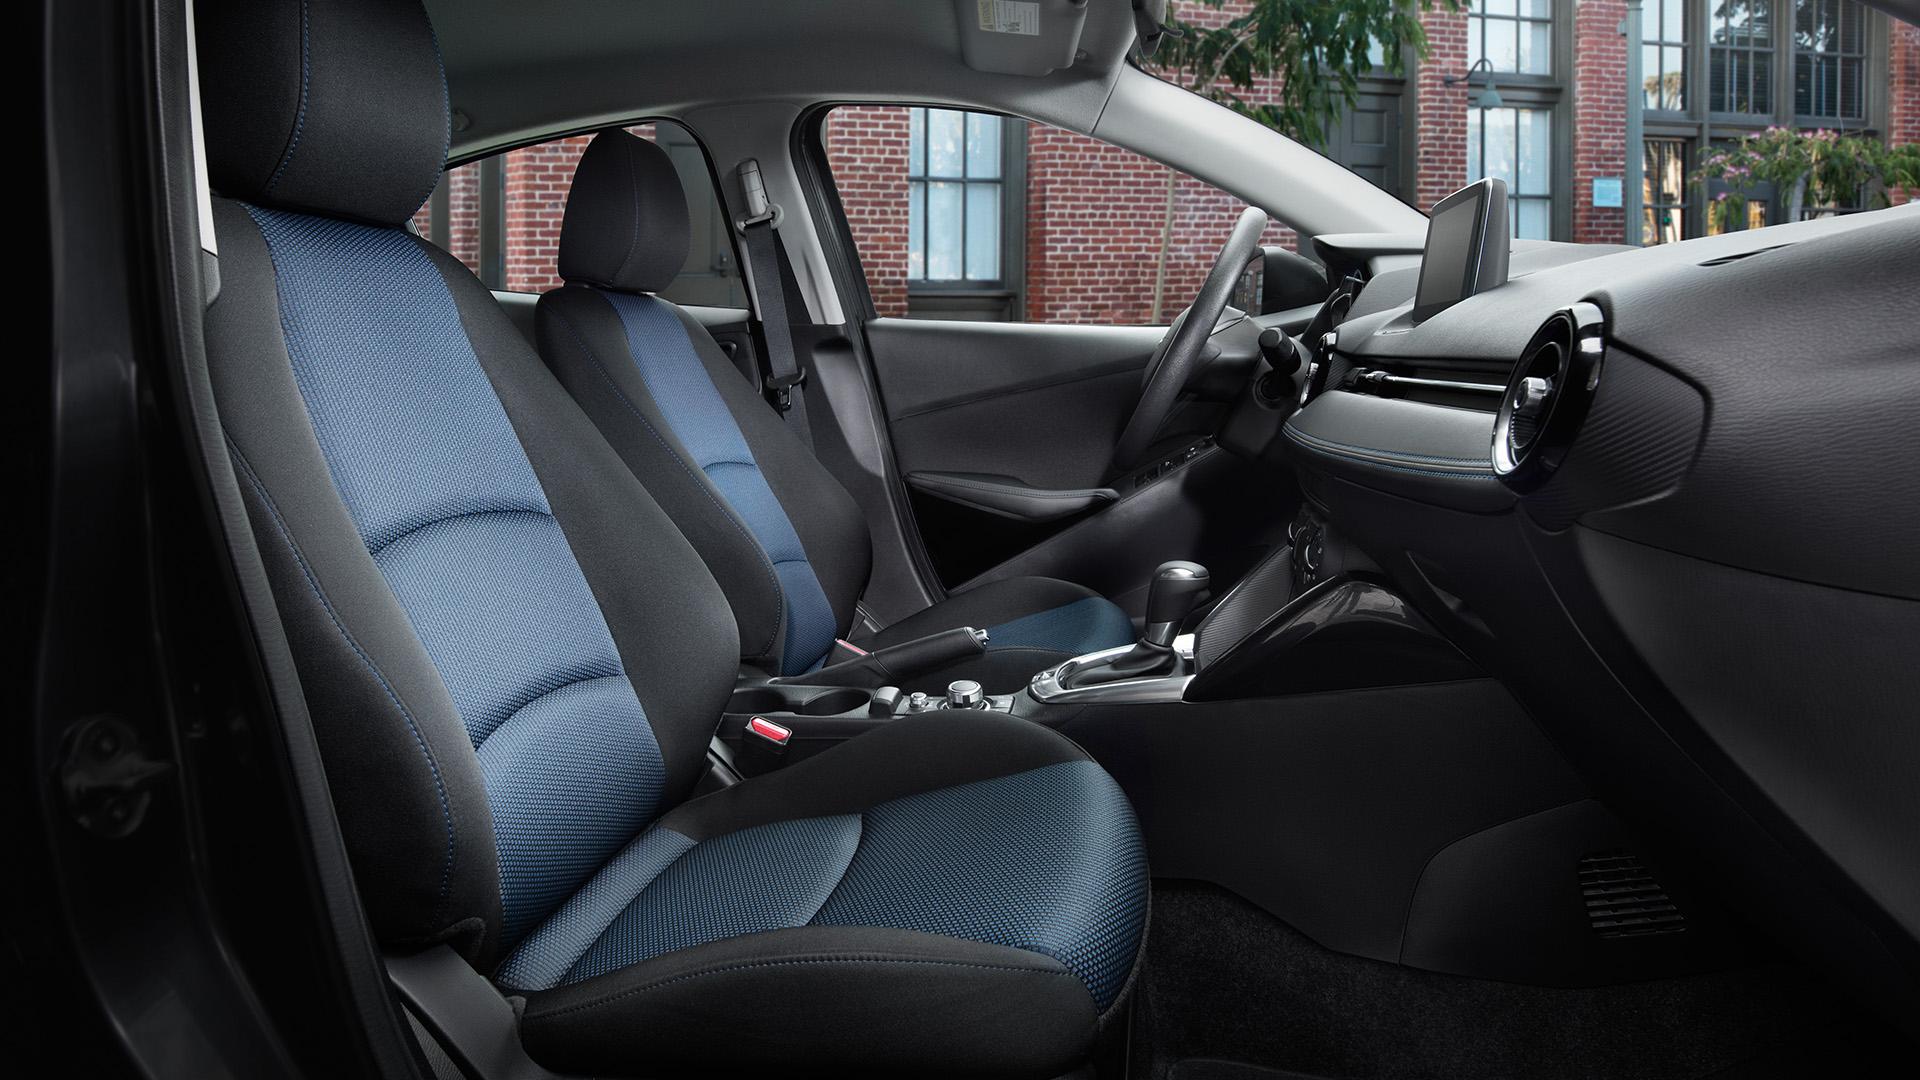 2017 Toyota Yaris Ia Overview The News Wheel